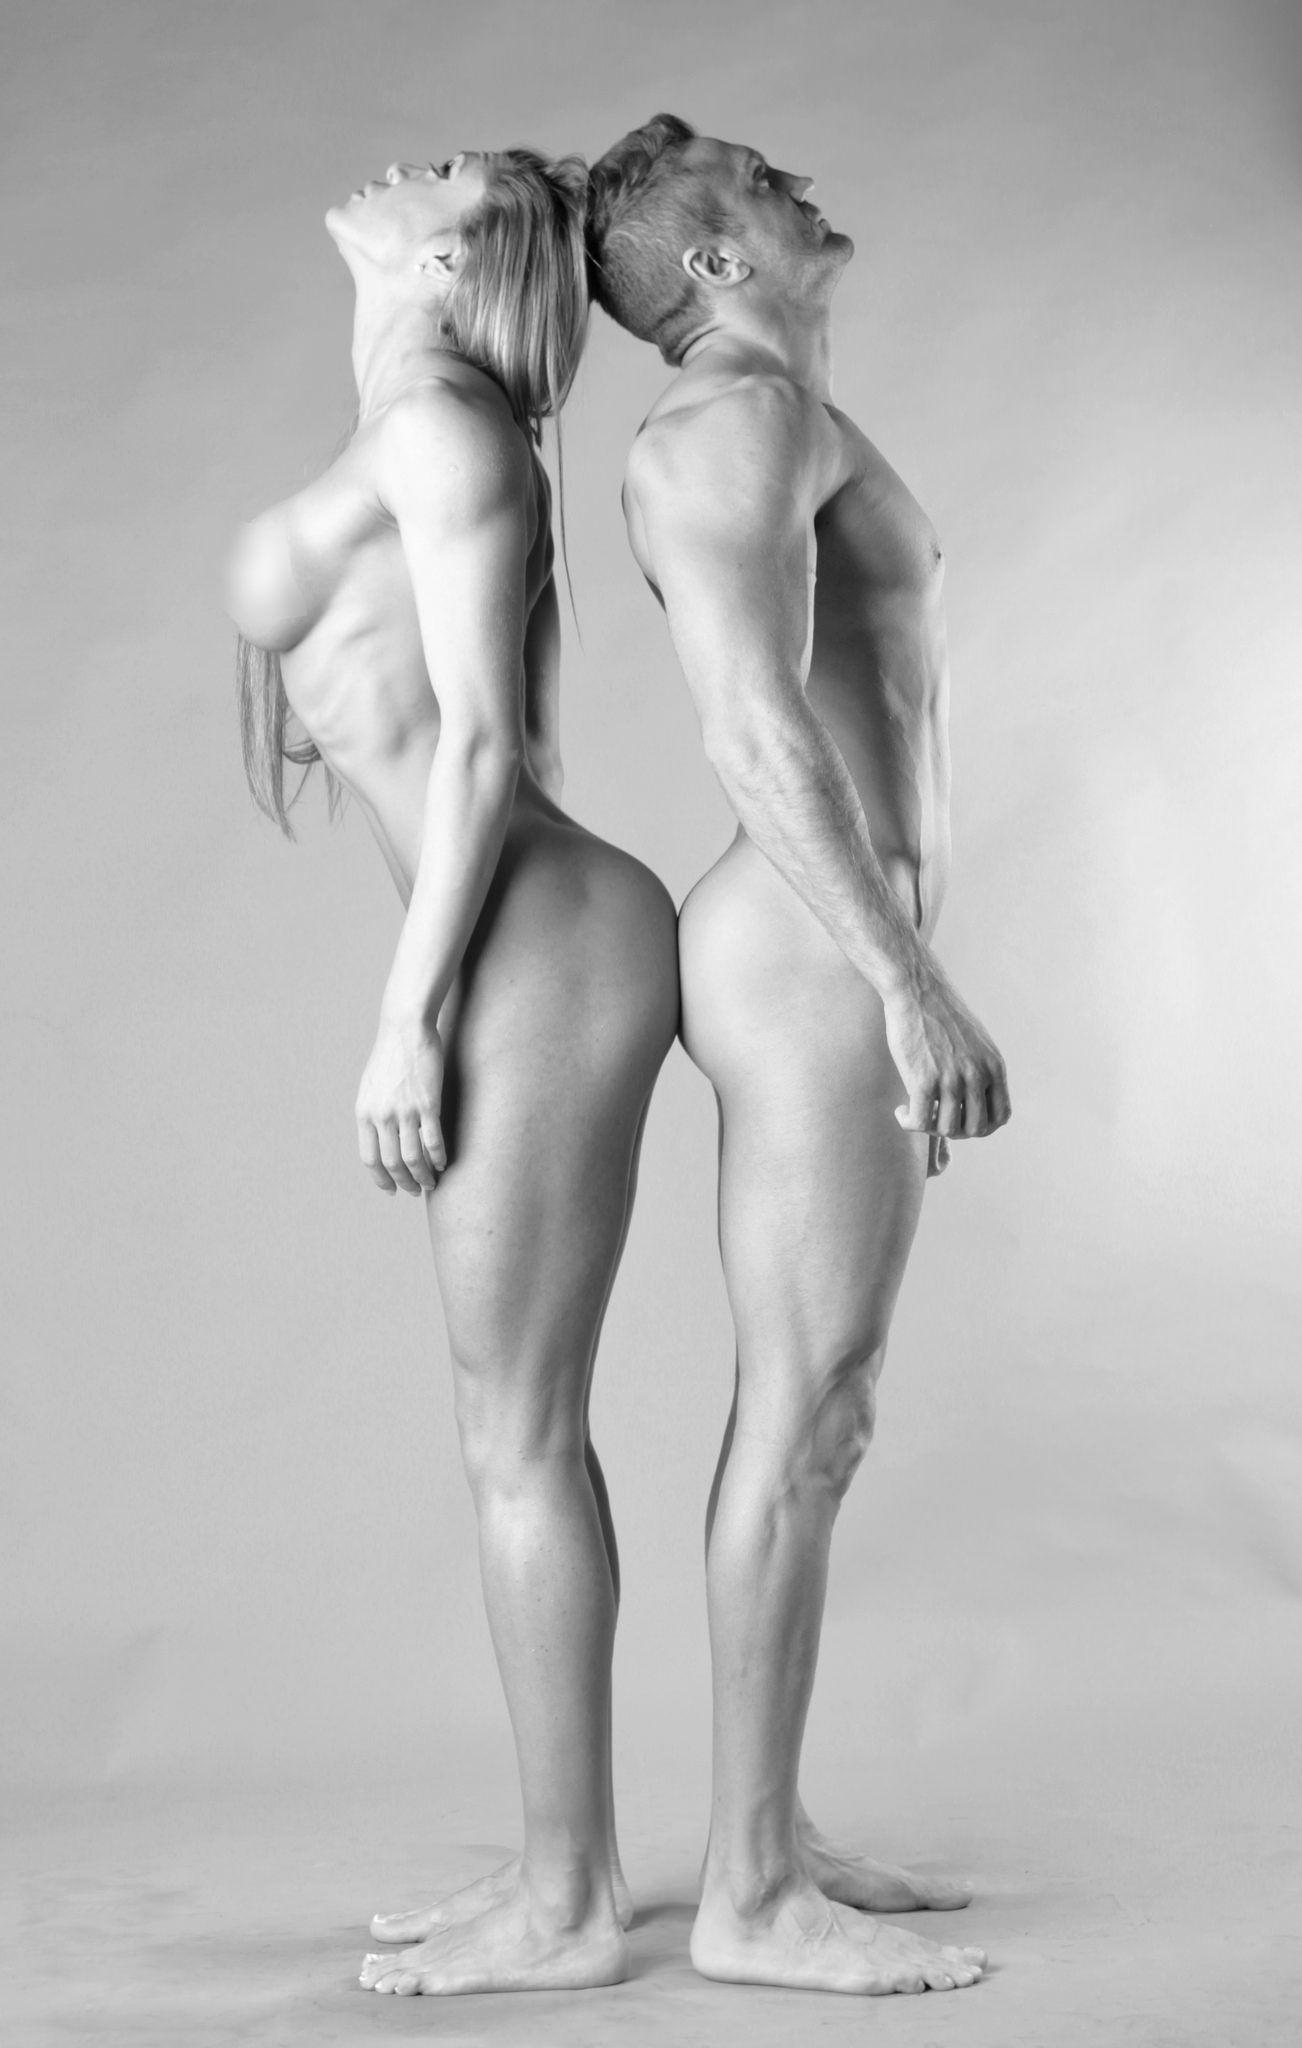 Pamela Pombo   ANATOMY / FIGURE STUDIES   Pinterest   Anatomy ...